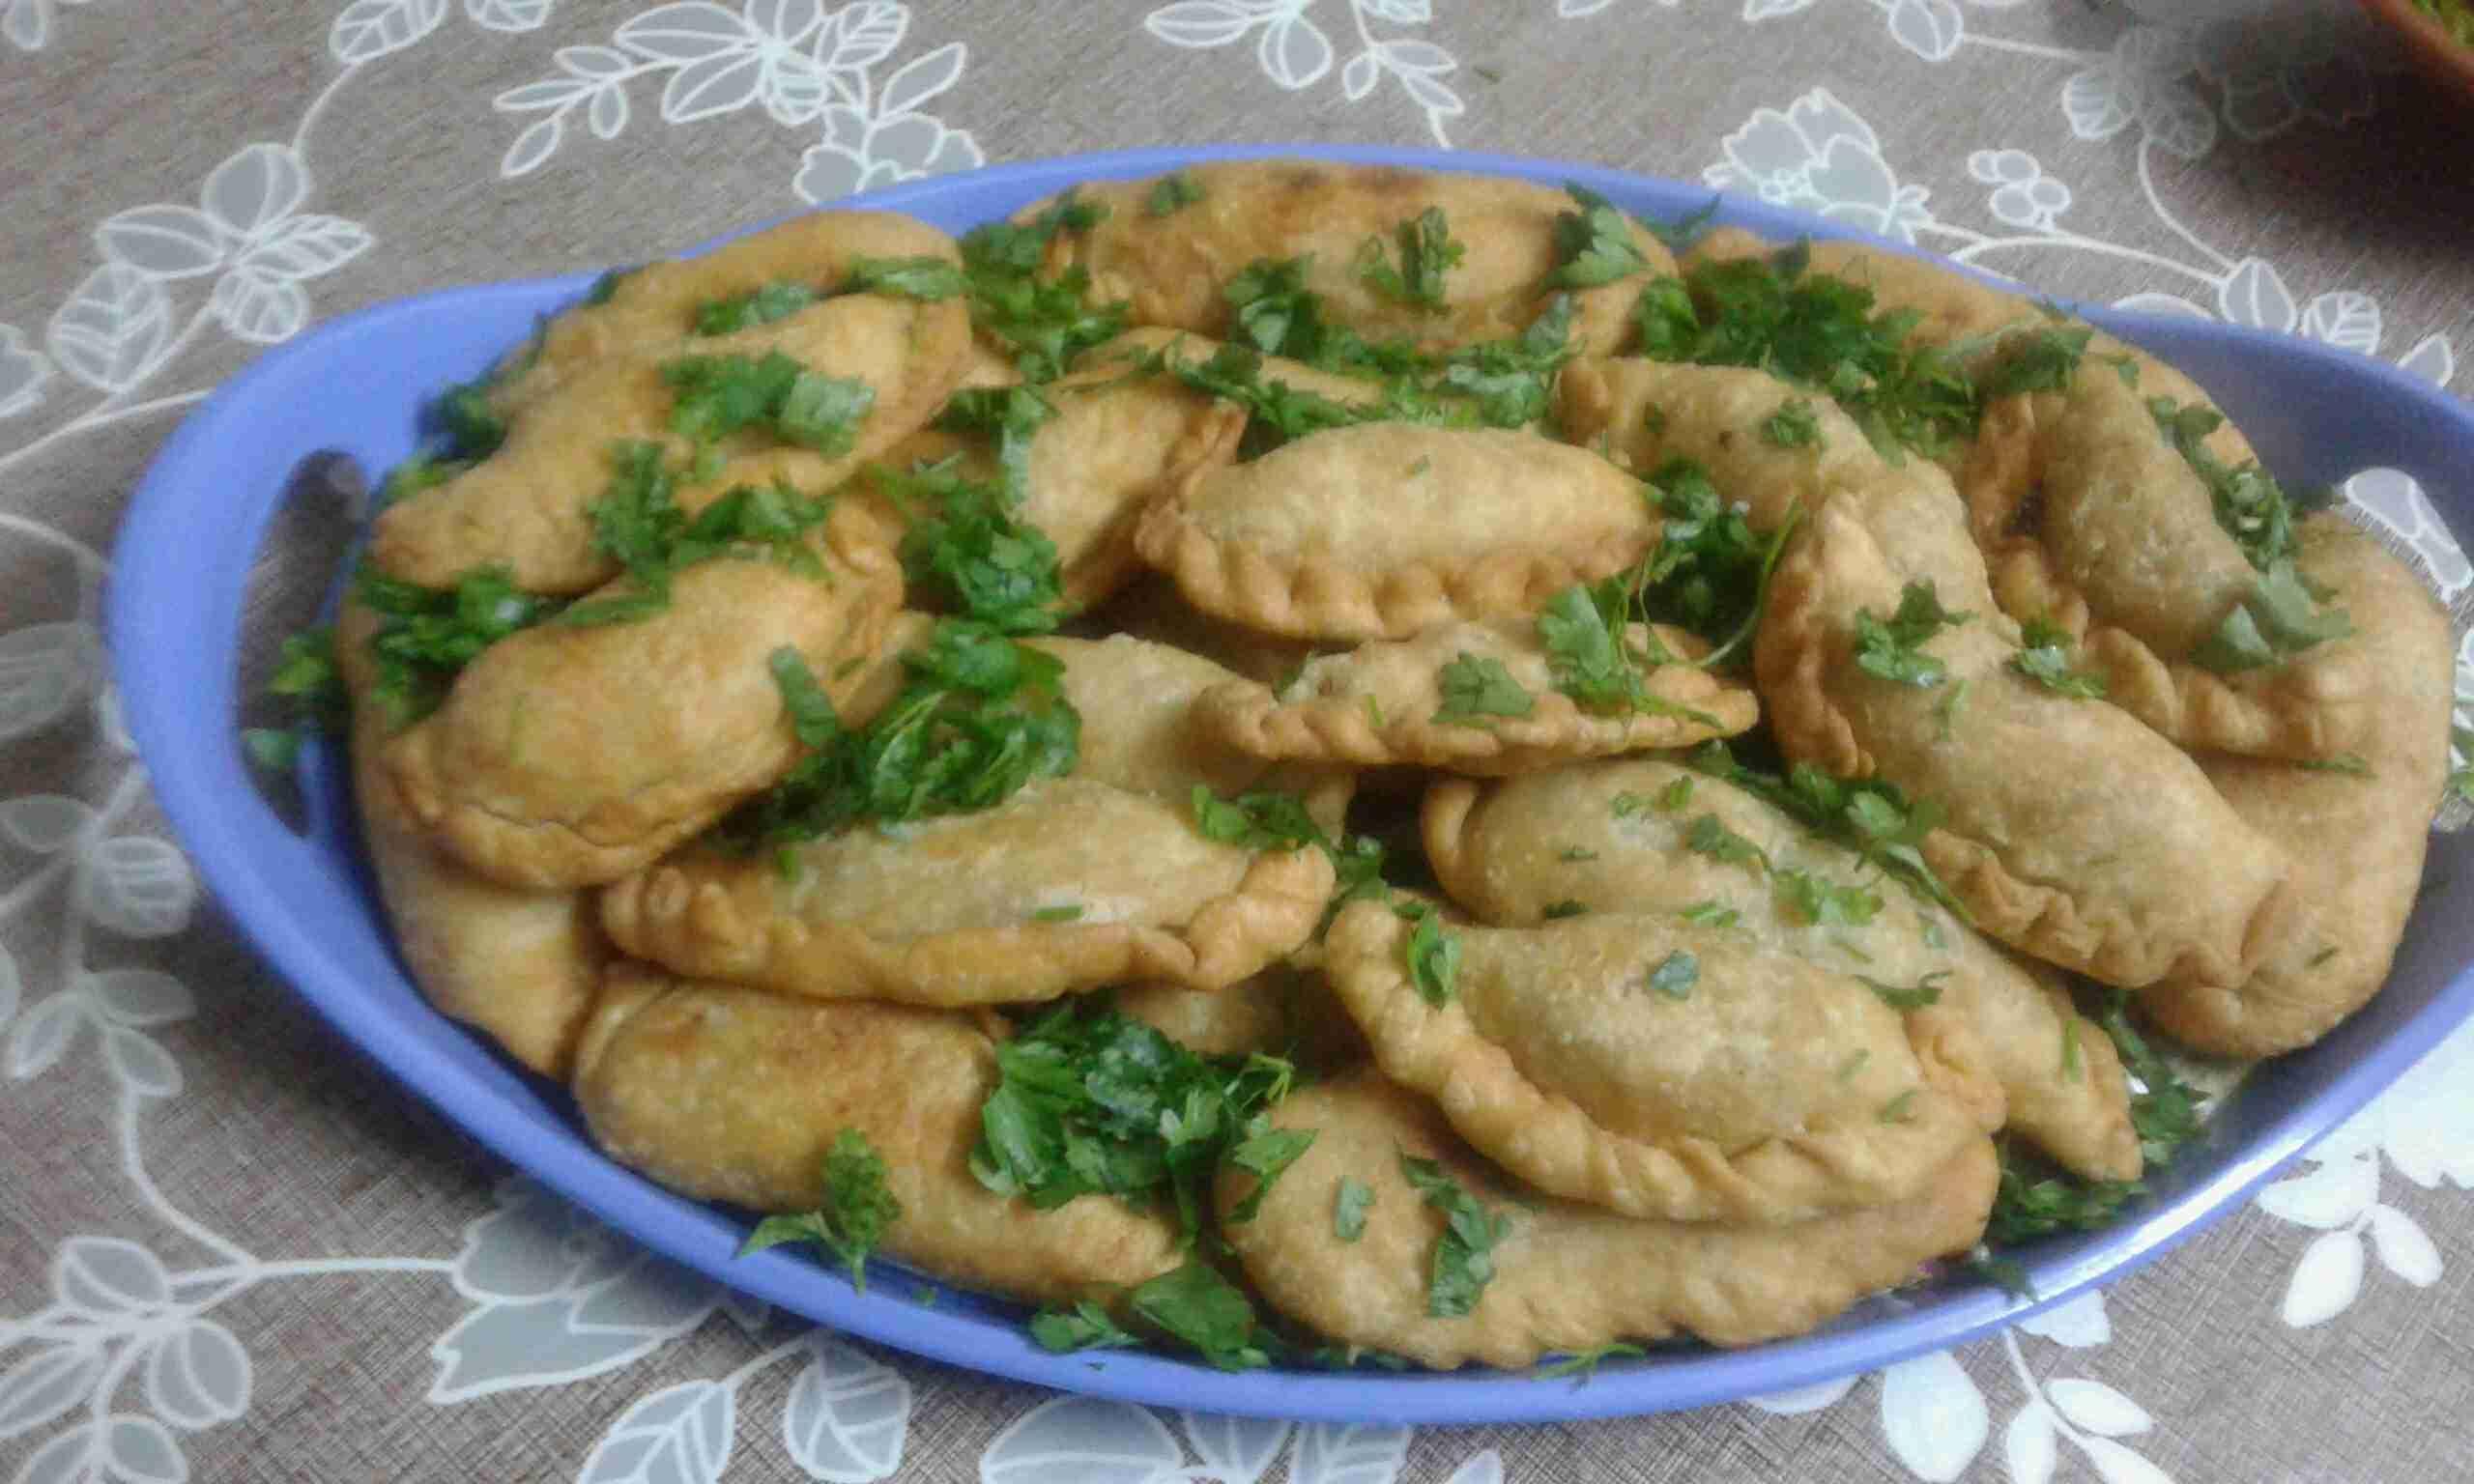 سمبوسك بصدور الدجاج ملكة أطباق فطور رمضان زاكي Food Chicken Meat